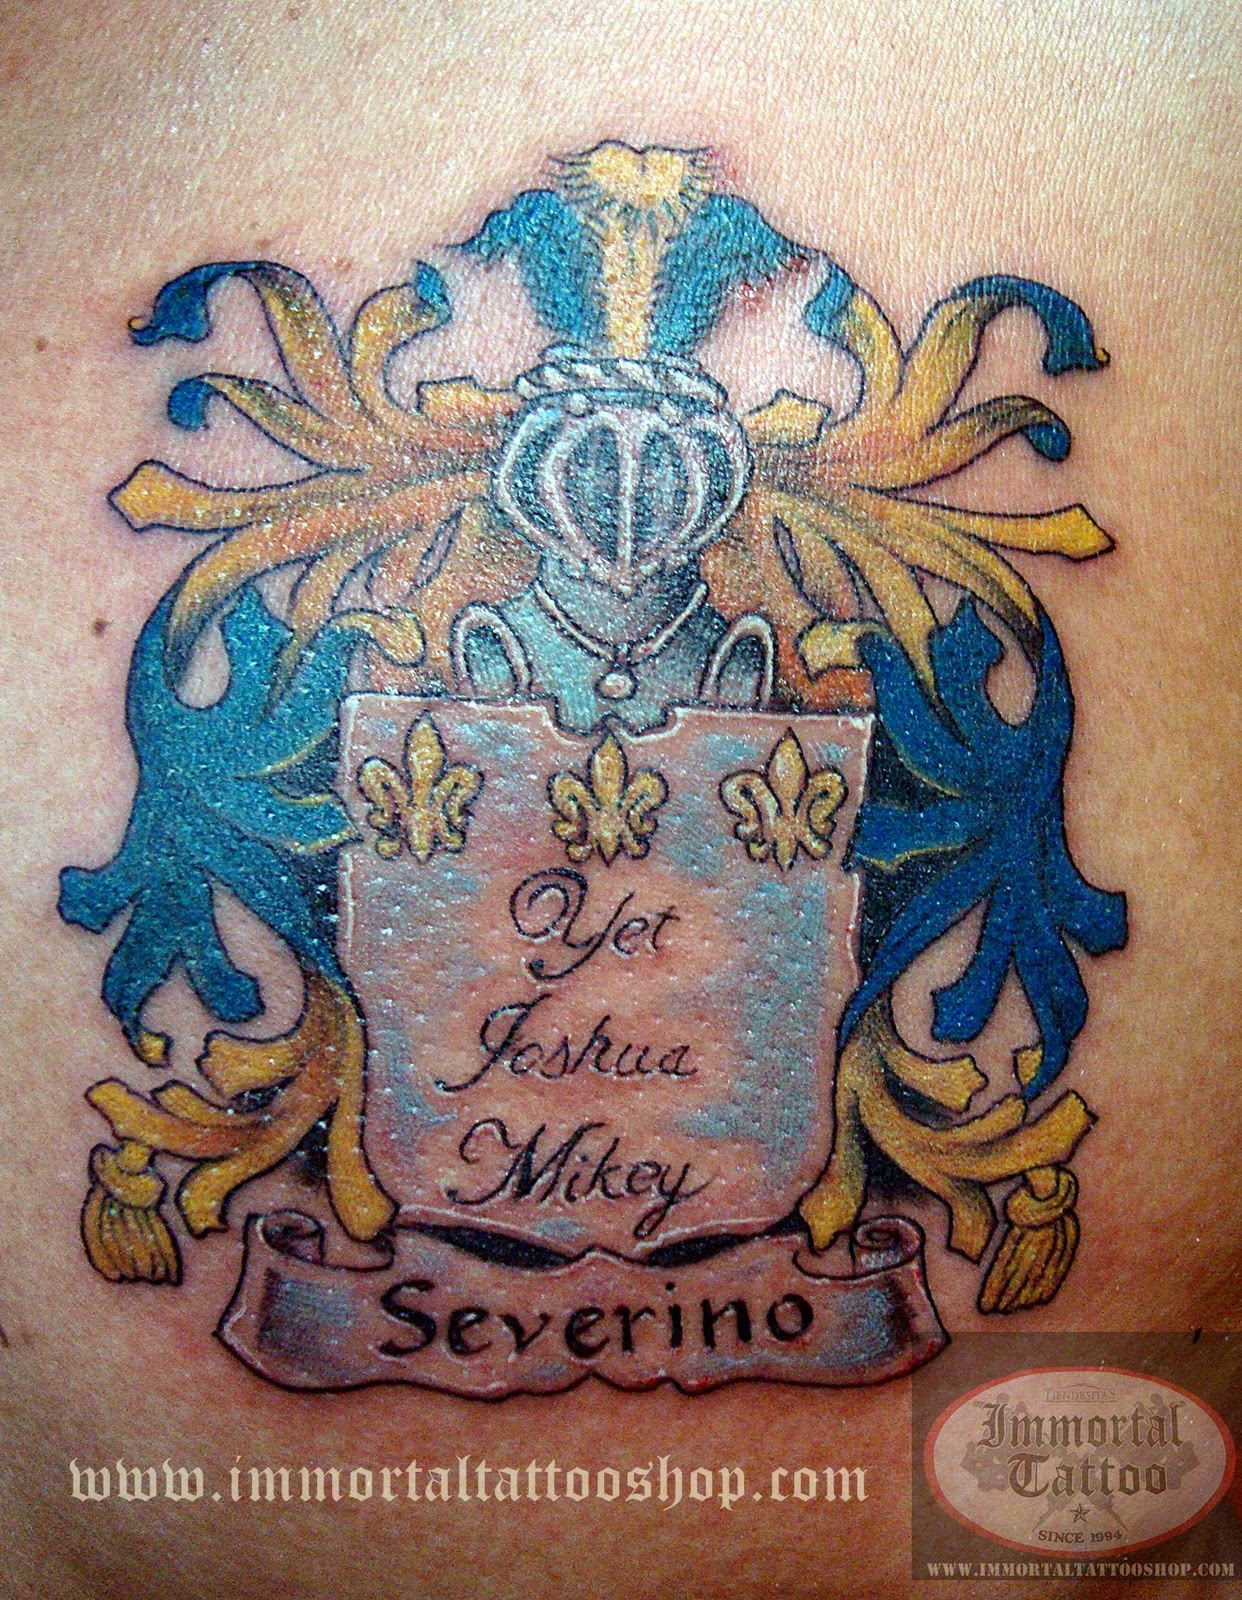 Immortal Tattoo Manila Philippines By Frank Ibanez Jr Severino